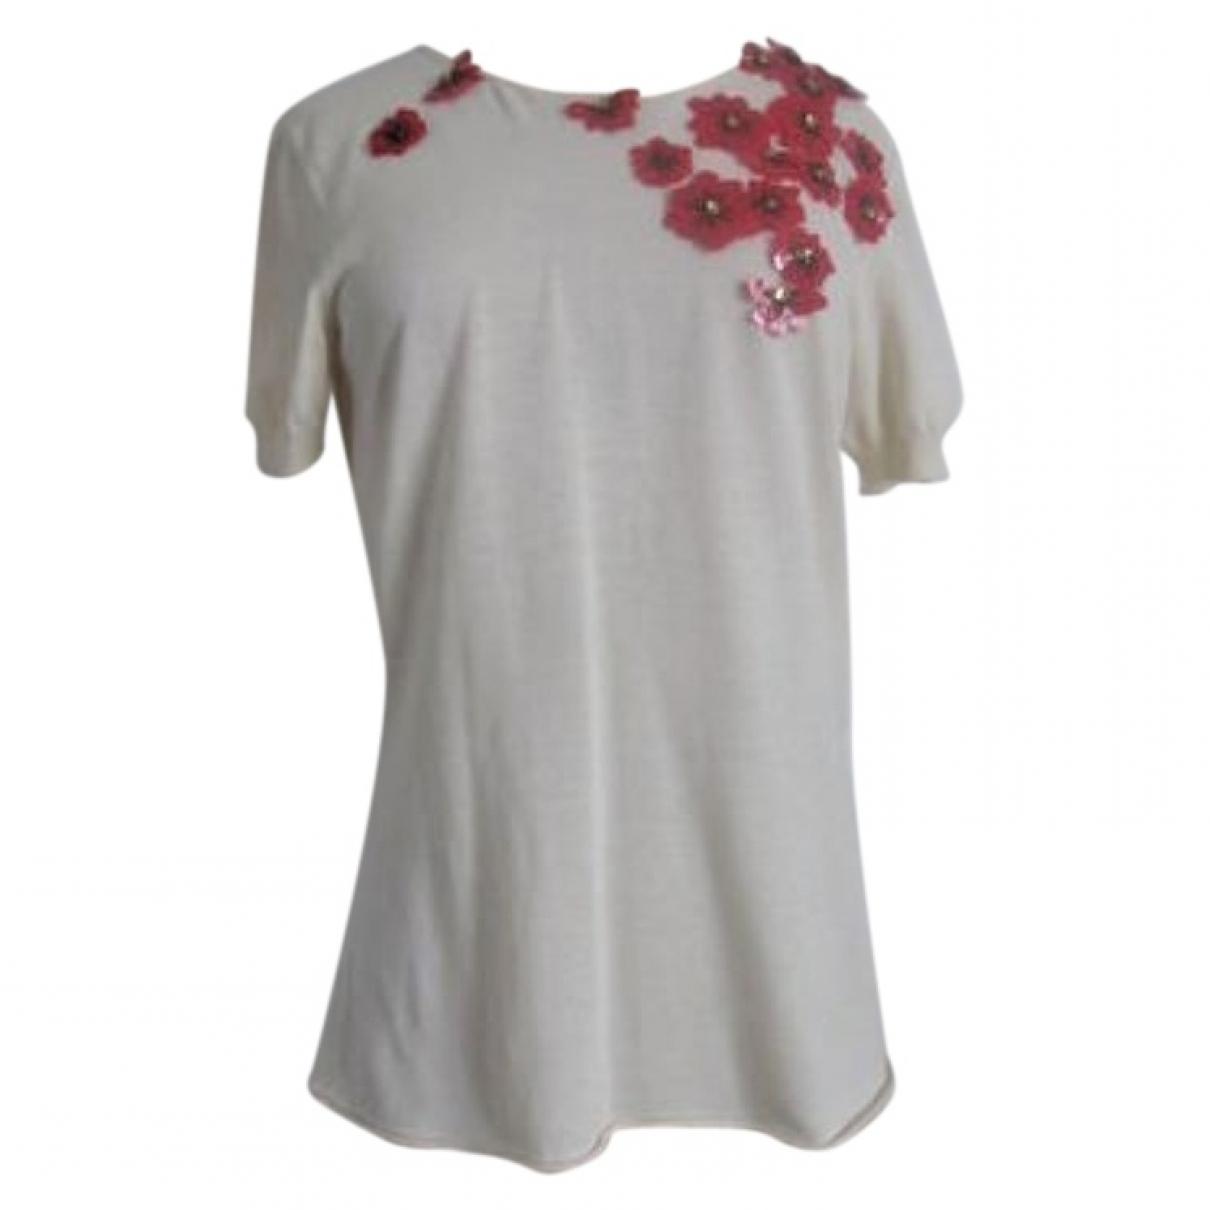 Lanvin \N Ecru Cotton  top for Women 38 FR